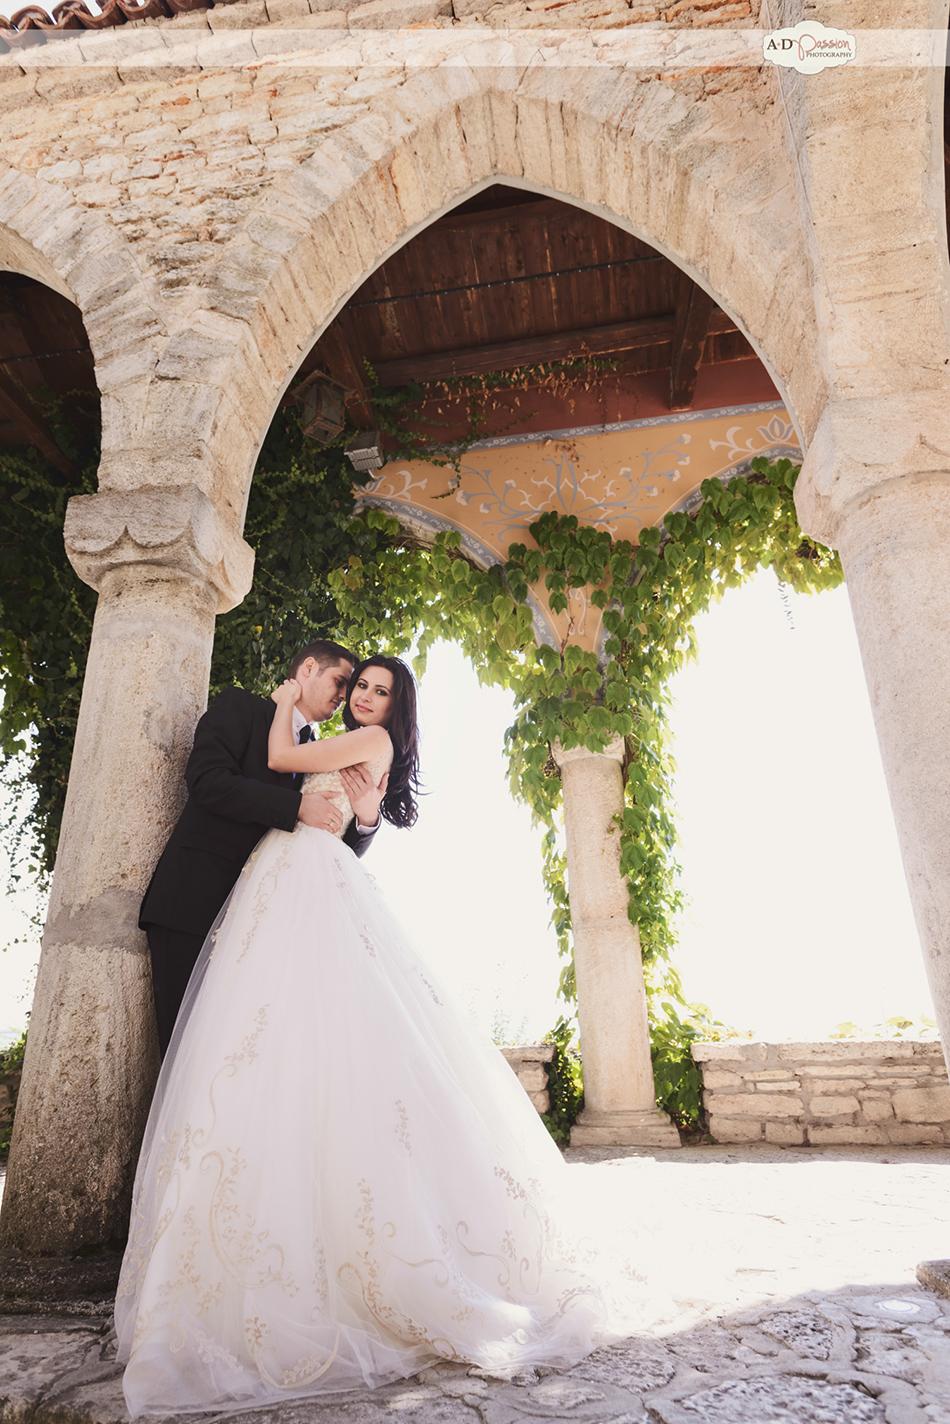 AD Passion Photography | 20131008_fotograf-nunta-profesionist_after-wedding-balchik_razvan-si-eliza_0076 | Adelin, Dida, fotograf profesionist, fotograf de nunta, fotografie de nunta, fotograf Timisoara, fotograf Craiova, fotograf Bucuresti, fotograf Arad, nunta Timisoara, nunta Arad, nunta Bucuresti, nunta Craiova